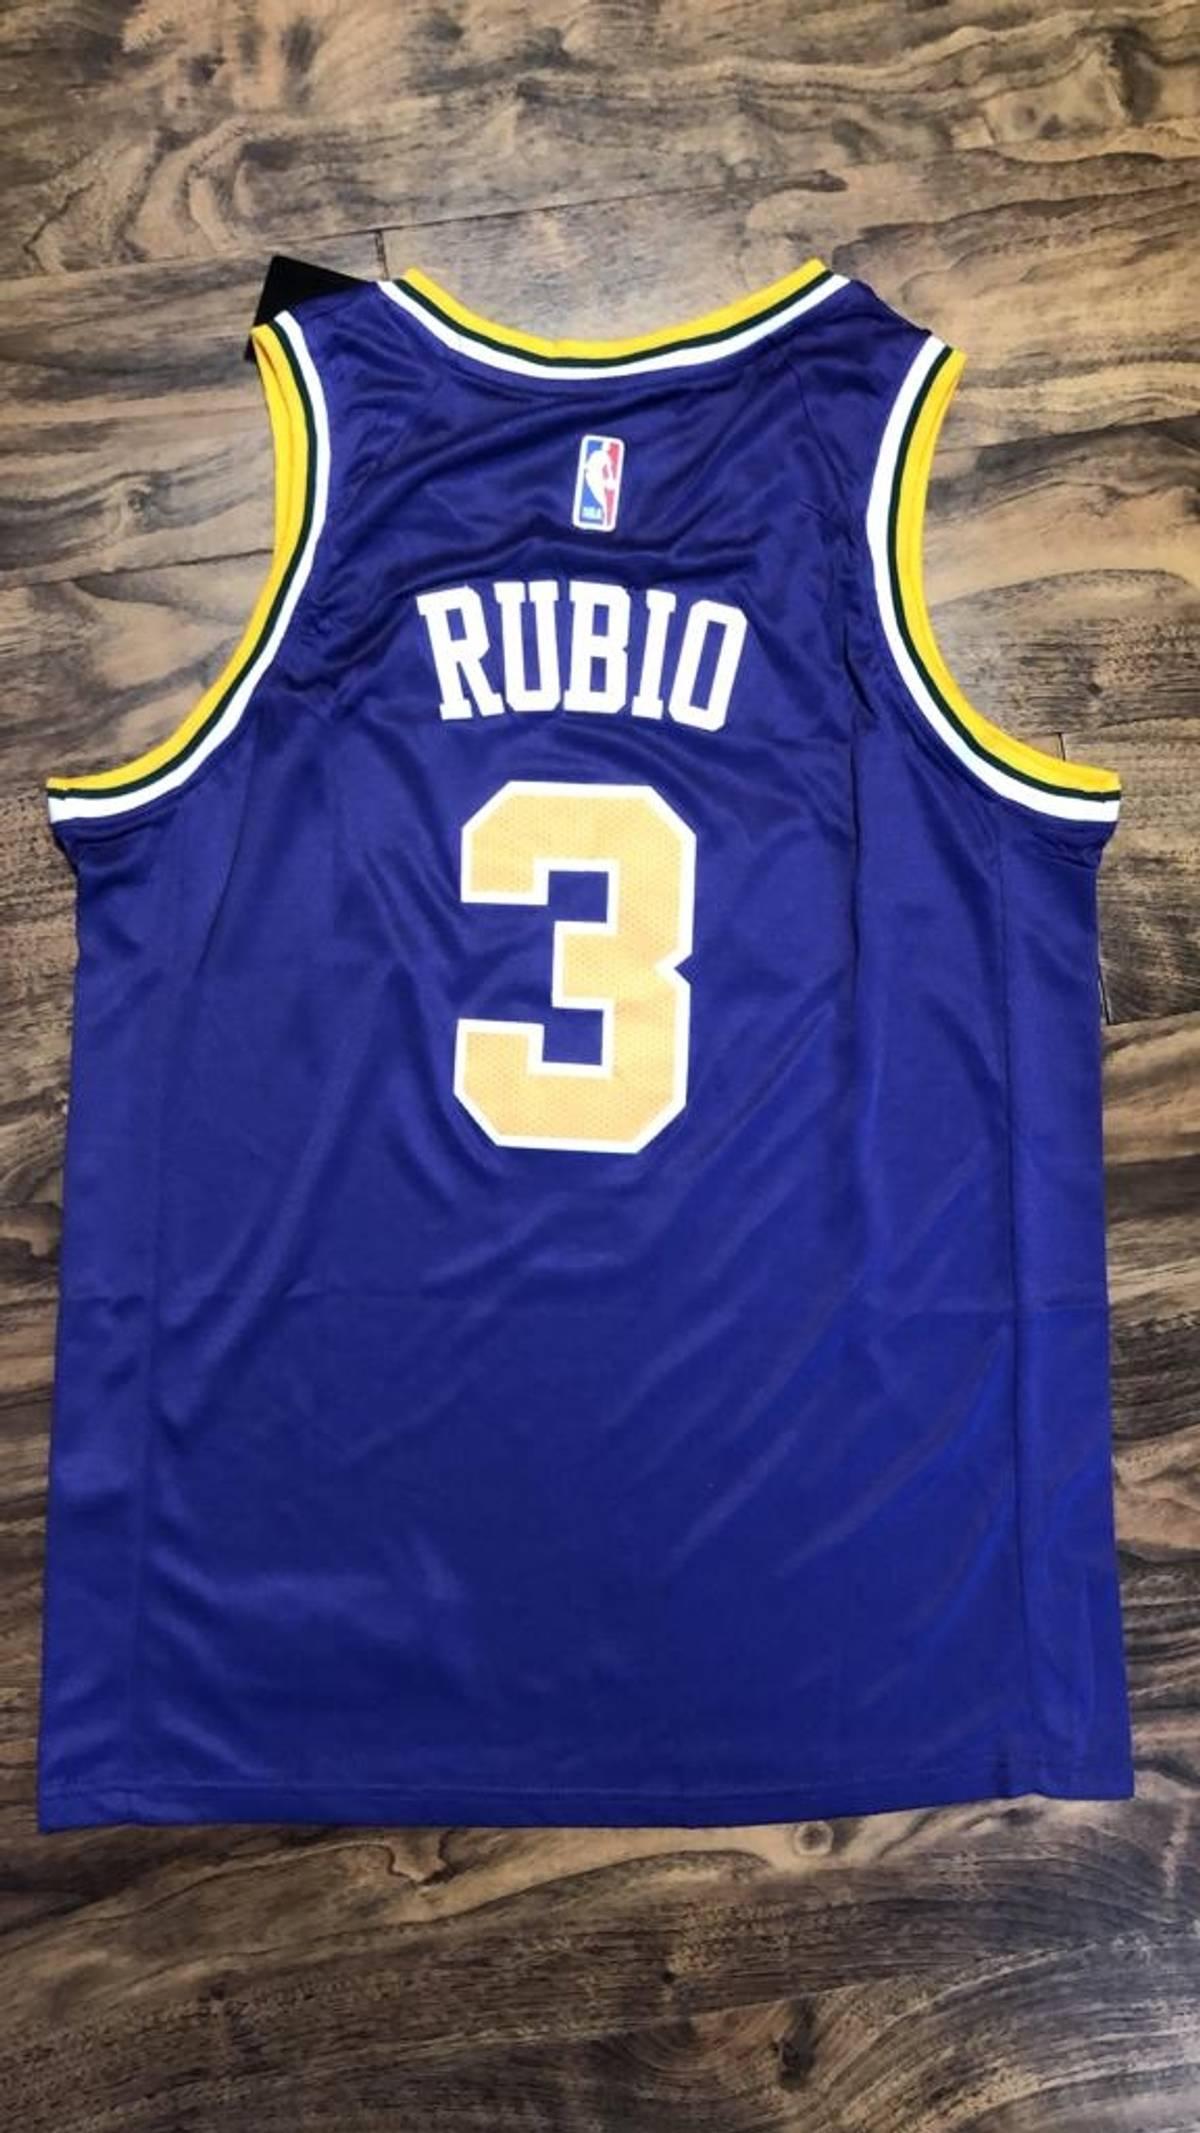 buy online a1788 90abb Nike Ricky Rubio Utah Jazz Jersey Size M $40